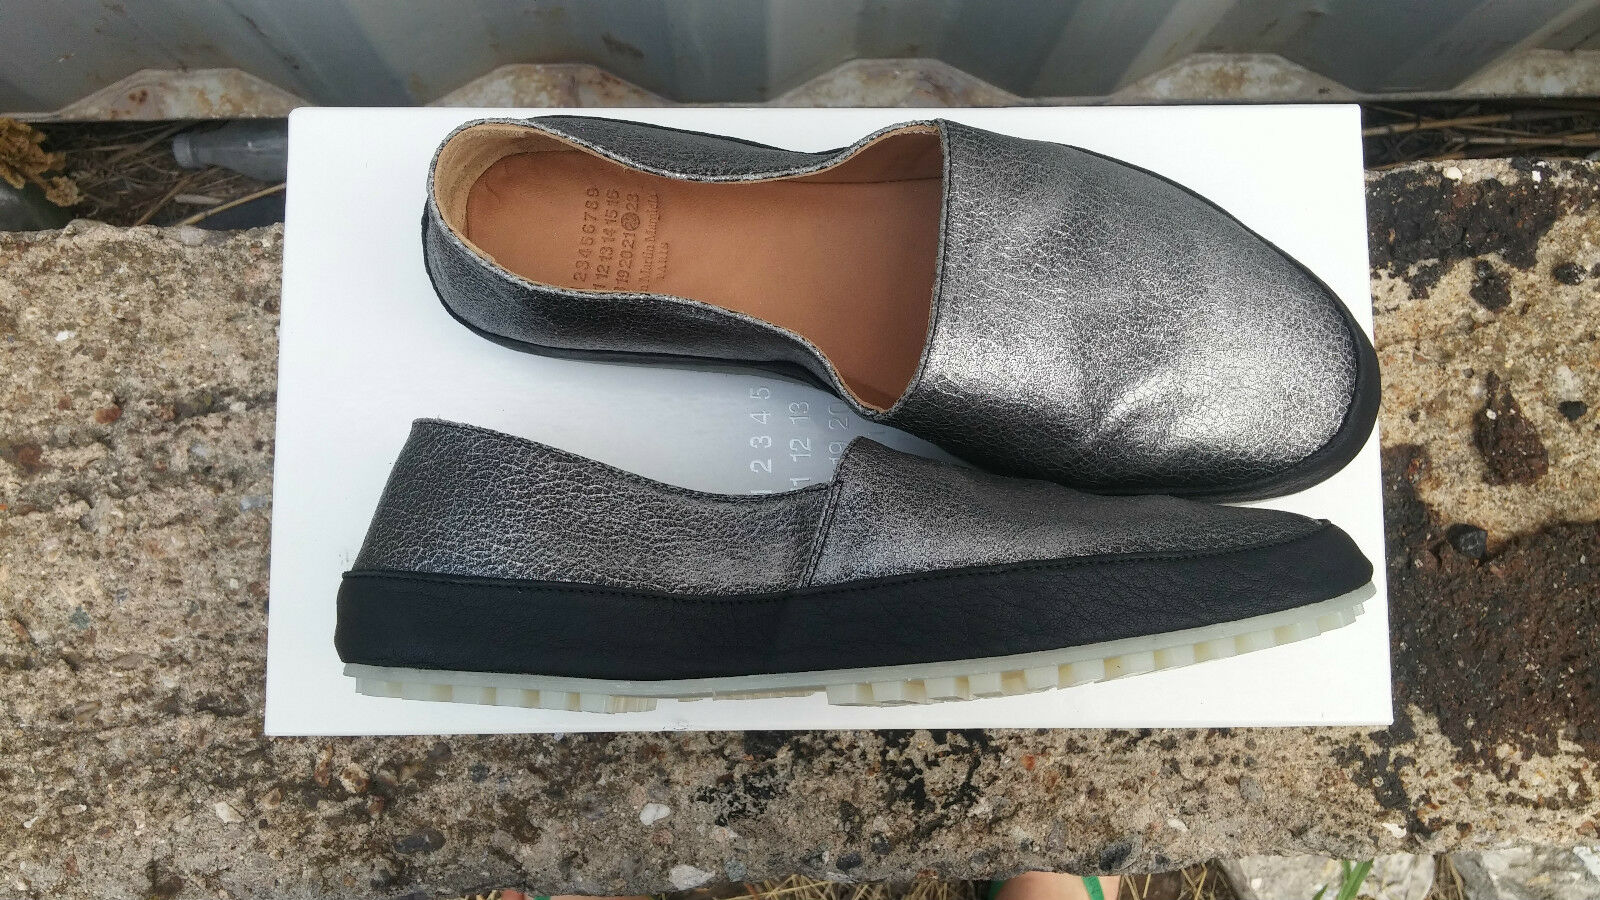 MAISON MARTIN MARGIELA Metallic Leather Espadrilles Slip Ons Flats shoes size 40